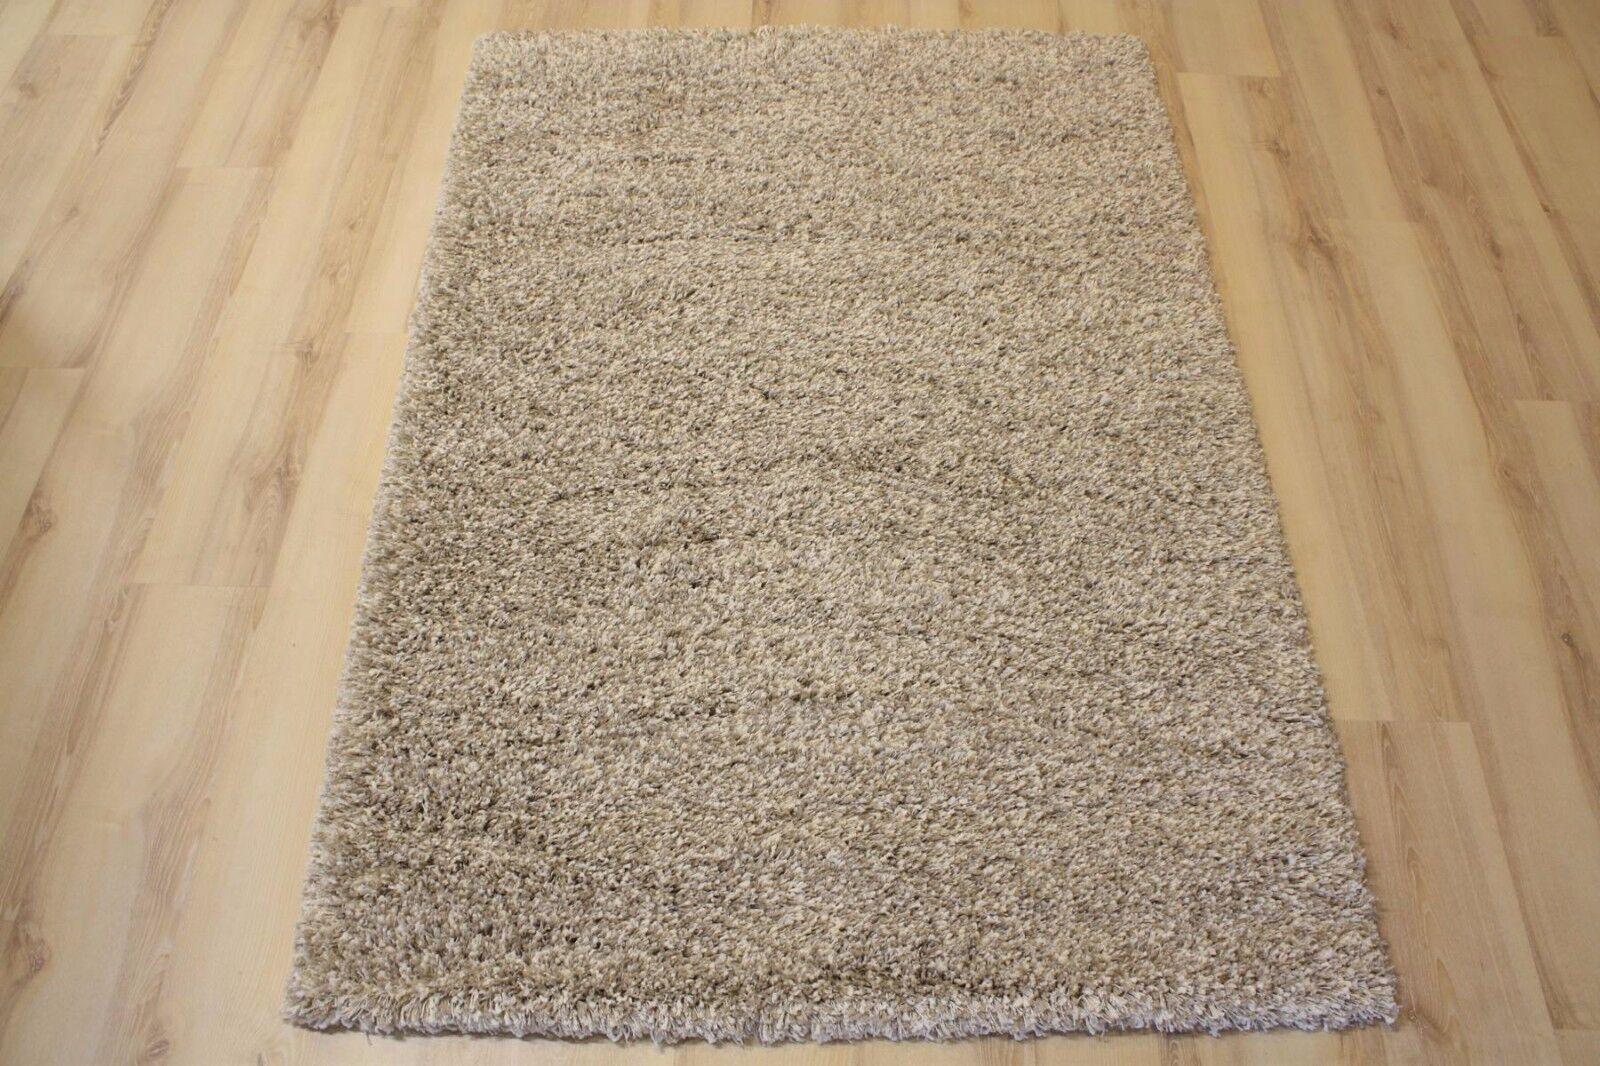 Teppich Langflor 39001 Twilight 2211 2211 2211 Weiß-Linen 133x195cm a5c7a8